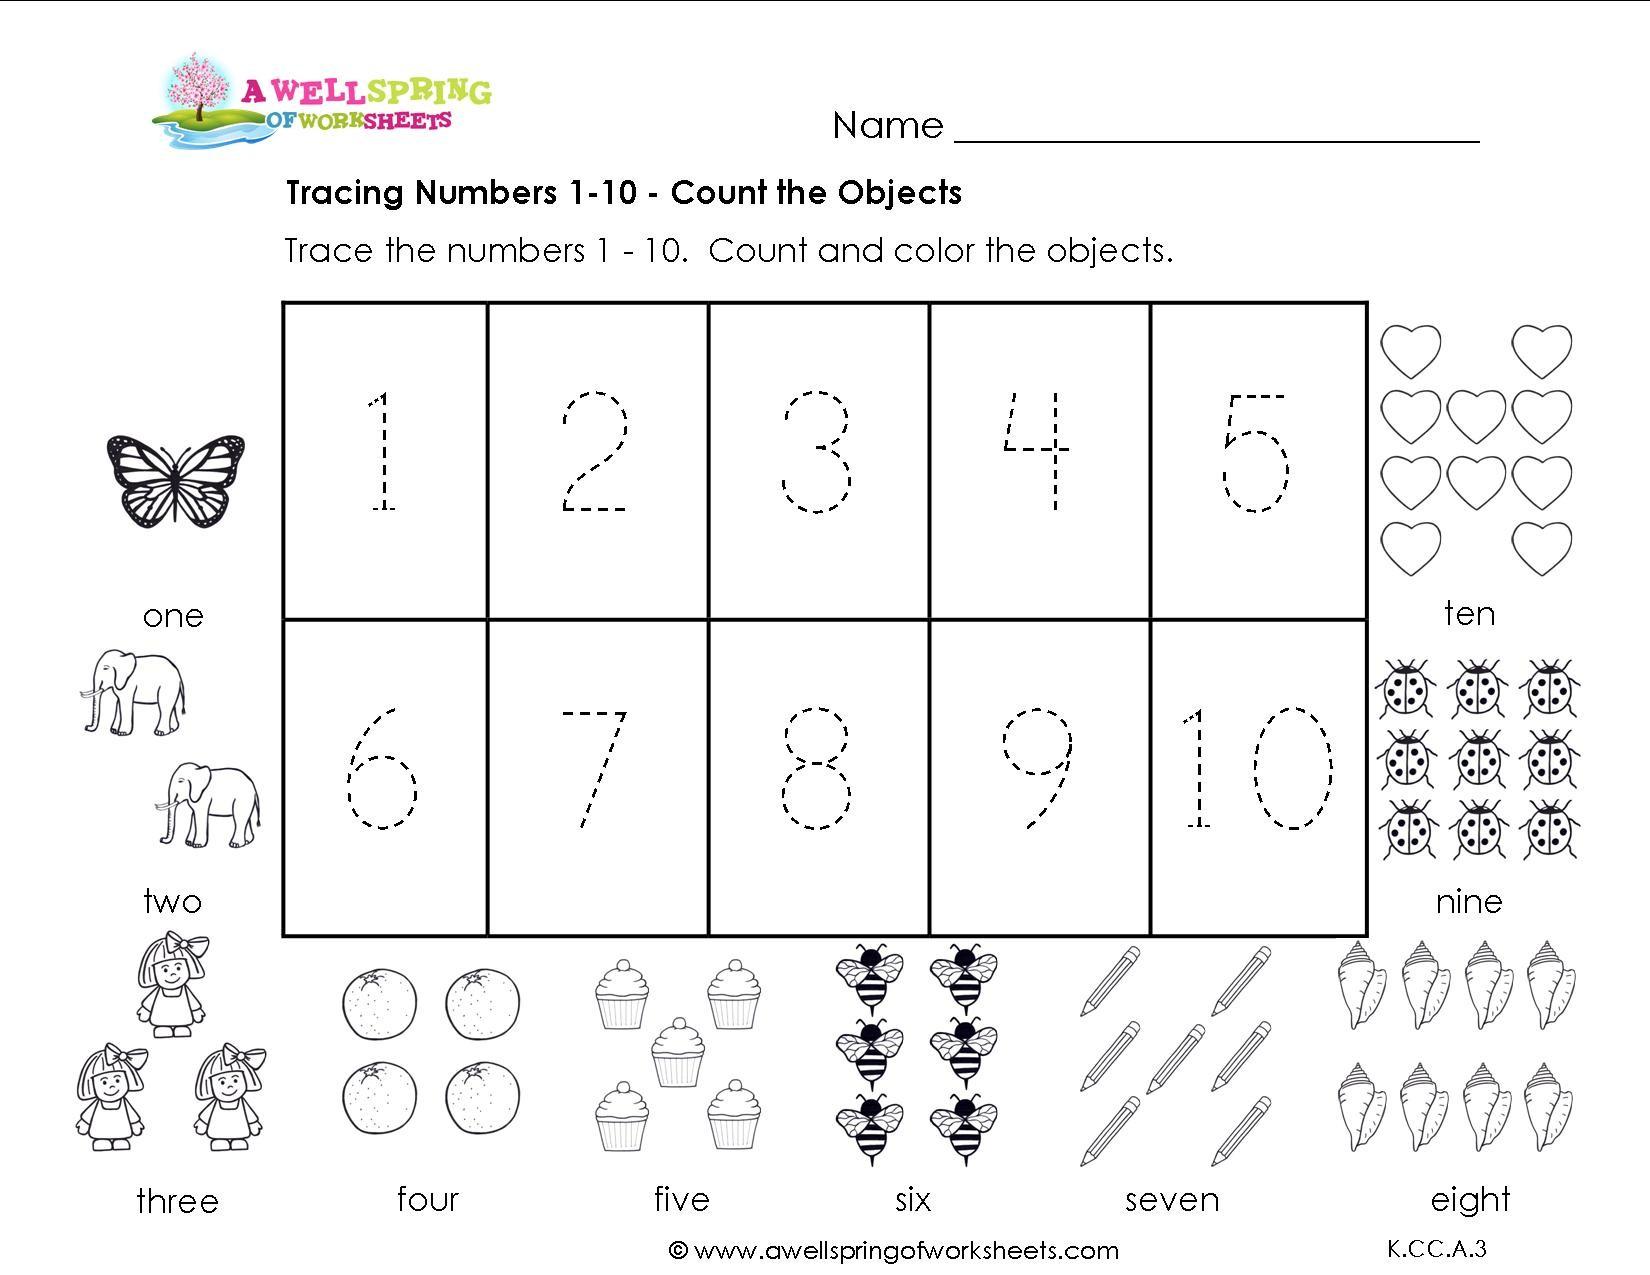 Number Tracing Worksheets 1 20  Printable Coloring Page For Kids And Number Tracing Worksheets 1 20